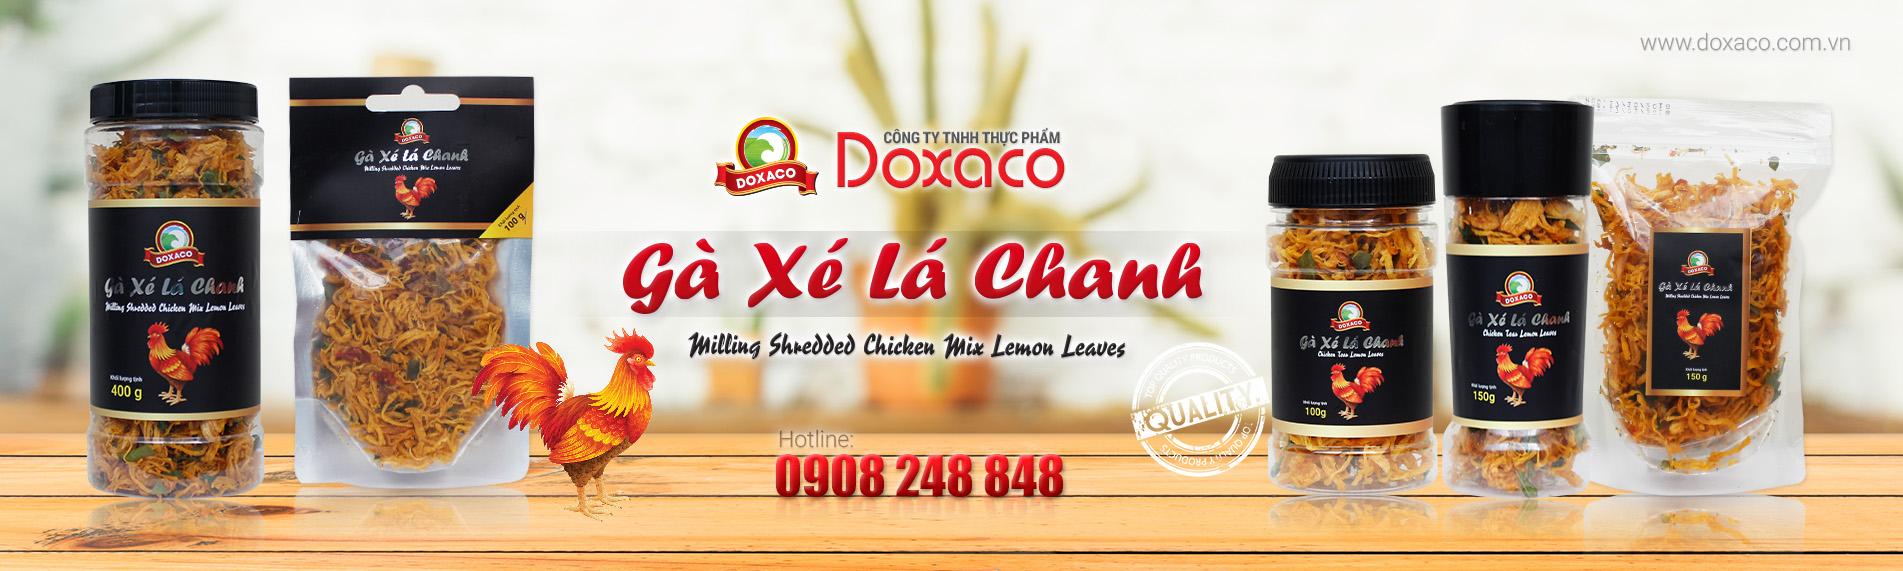 images/banners/banner-doxaco-ga-xe-la-chanh.jpg